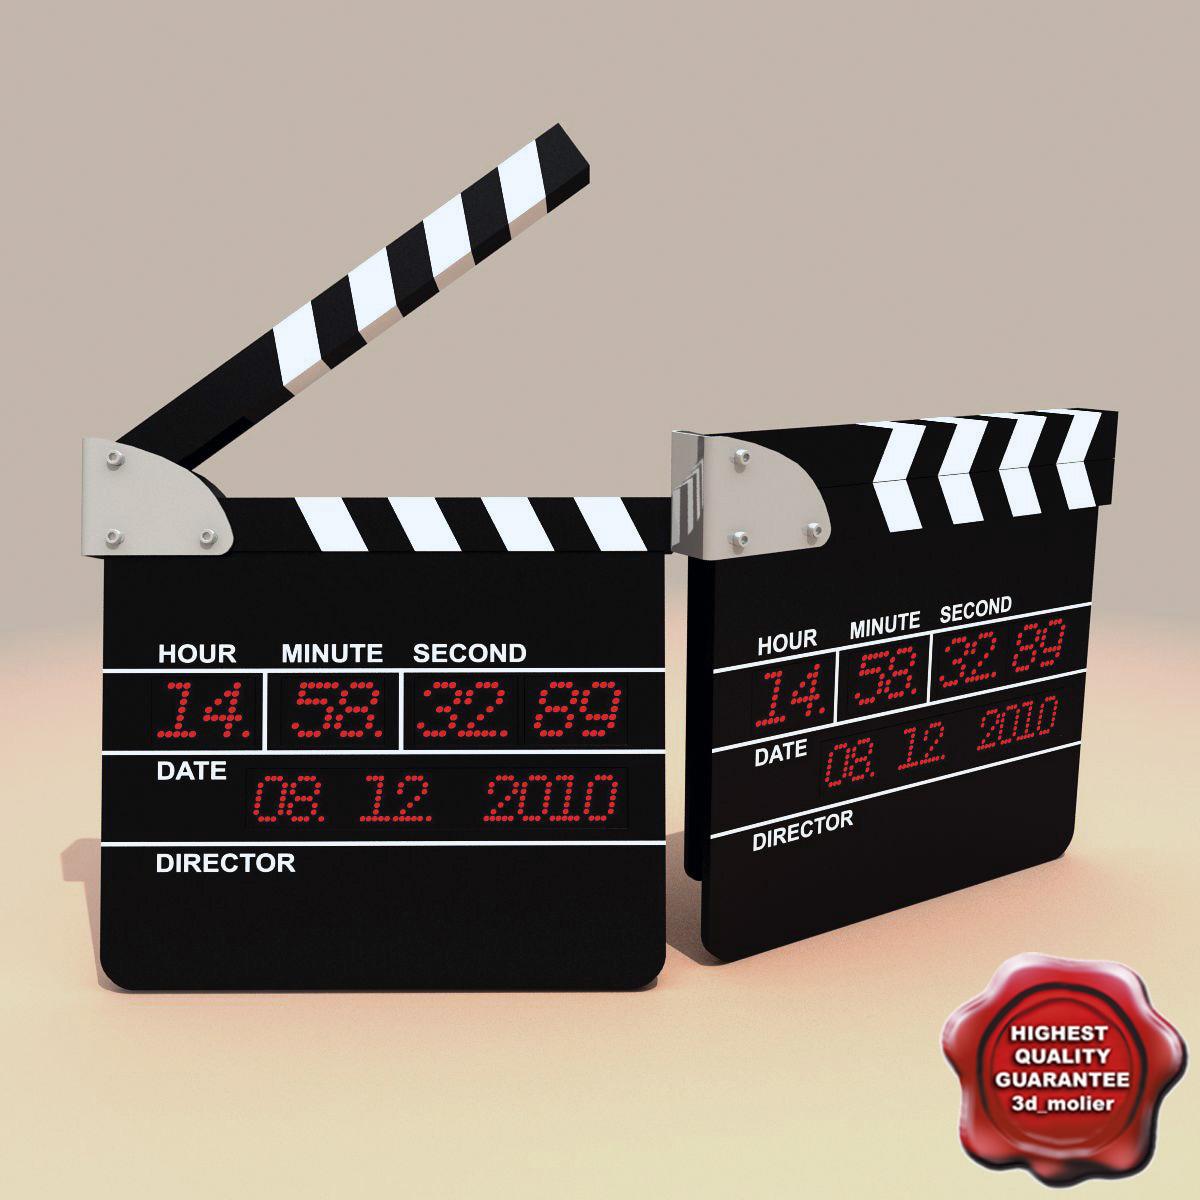 3d model of clapboard modelled